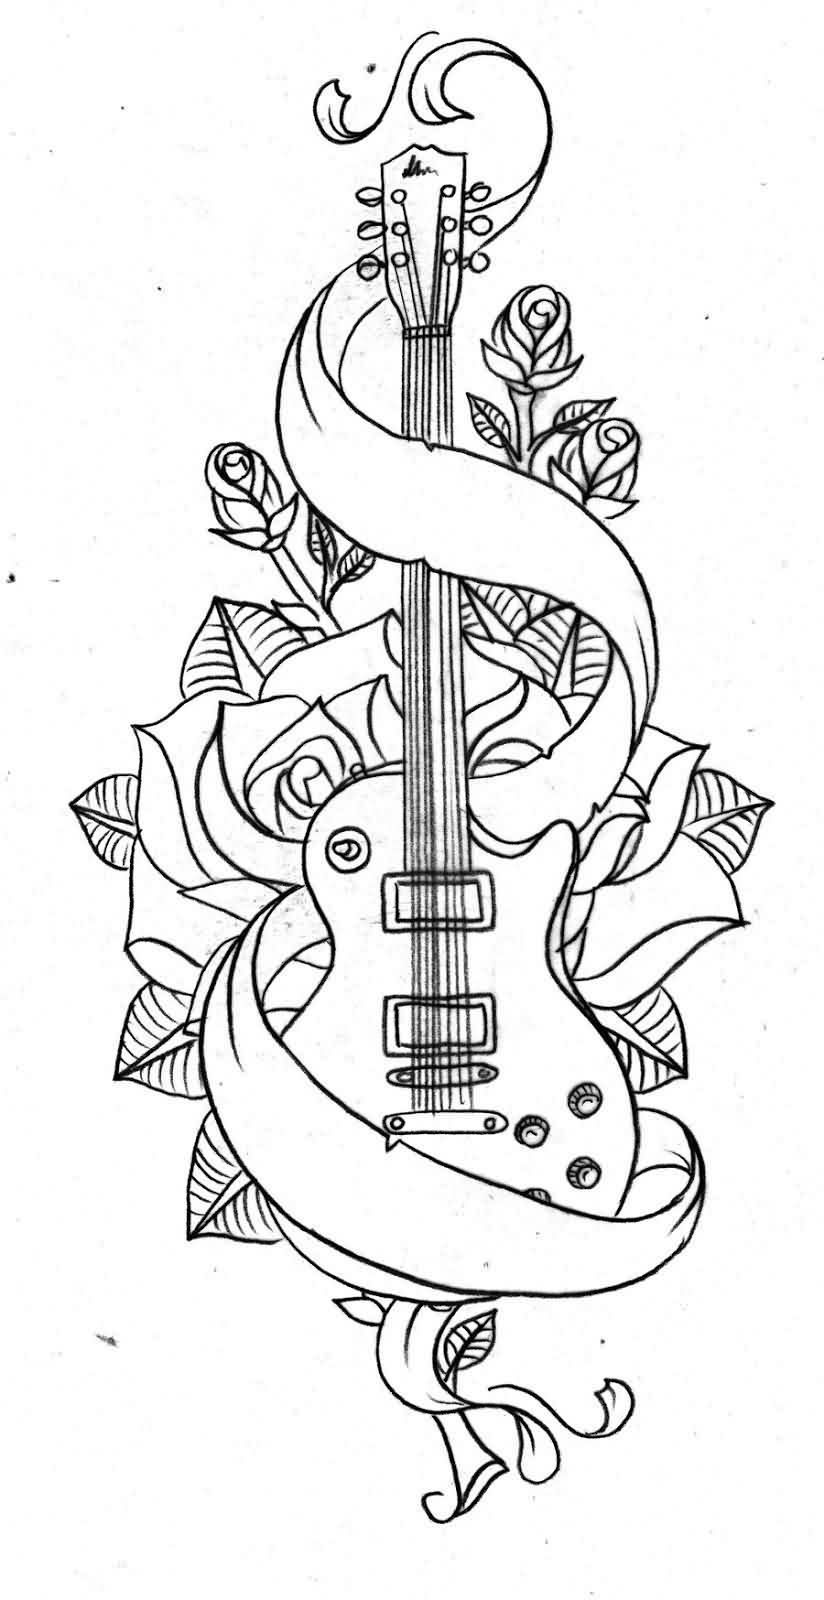 Pin De Sonia Snow En Tatuuus Dibujos De Guitarras Tatuaje Guitarra Disenos De Tatuaje De Musica